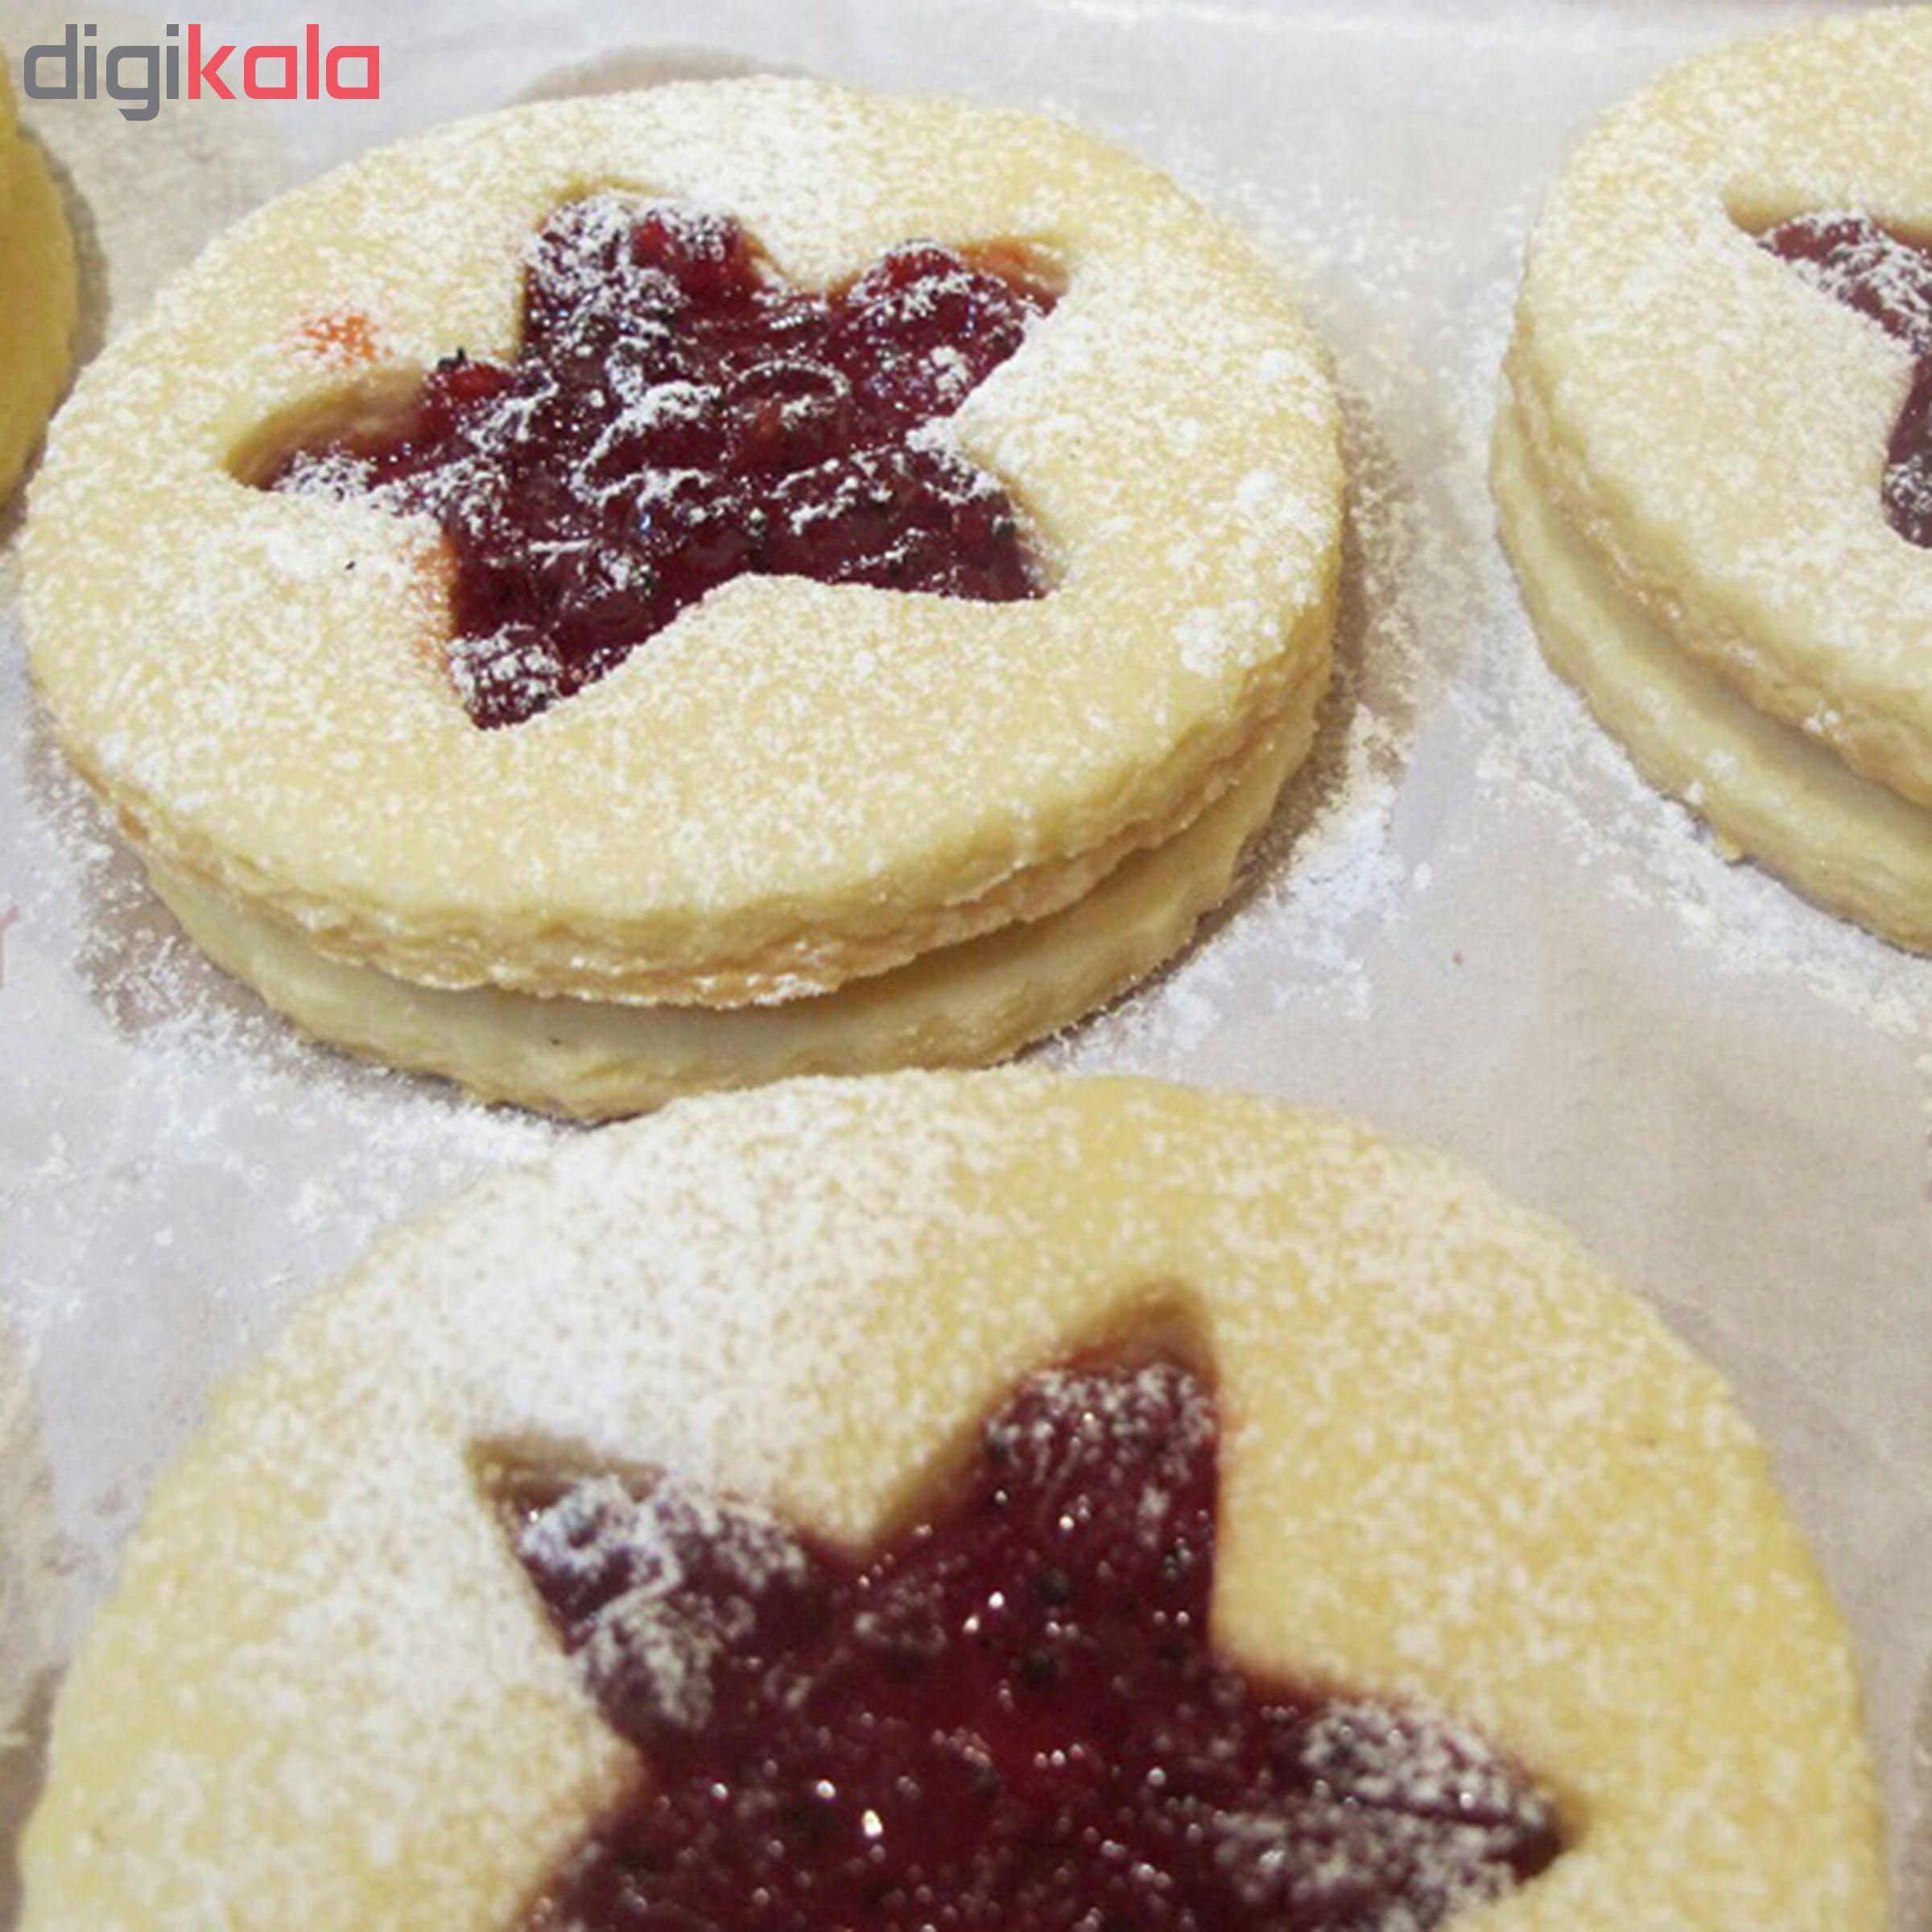 کاتر شیرینی پزی مدل Cookie Cutter بسته 12 عددی main 1 8